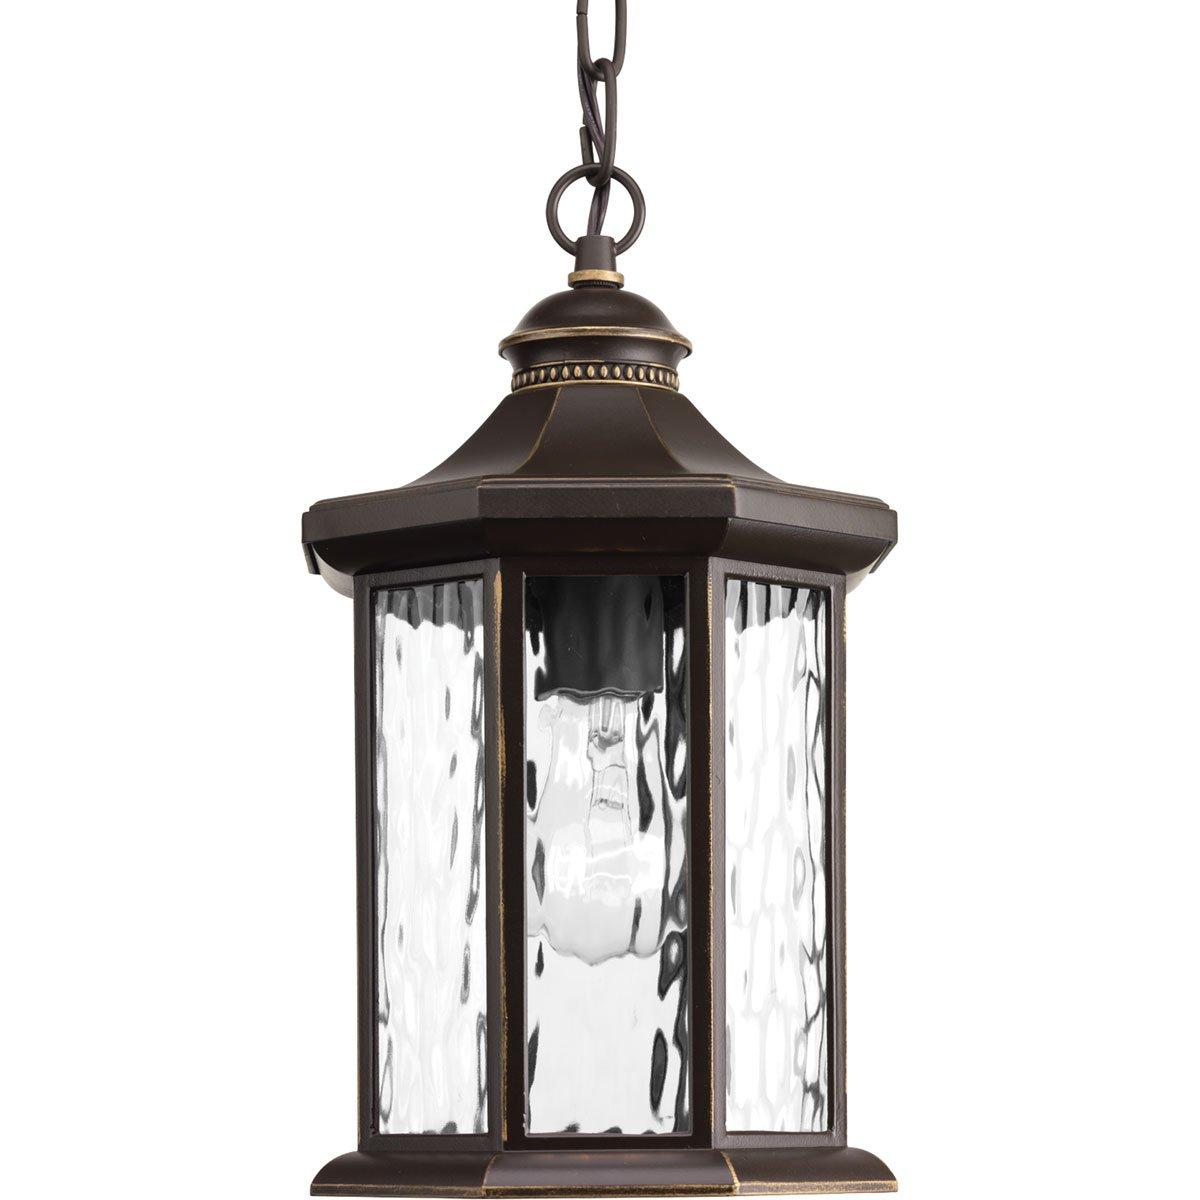 Progress Lighting P6529-20 Traditional/Classic 1-100W Med Hanging Lantern, Antique Bronze by Progress Lighting